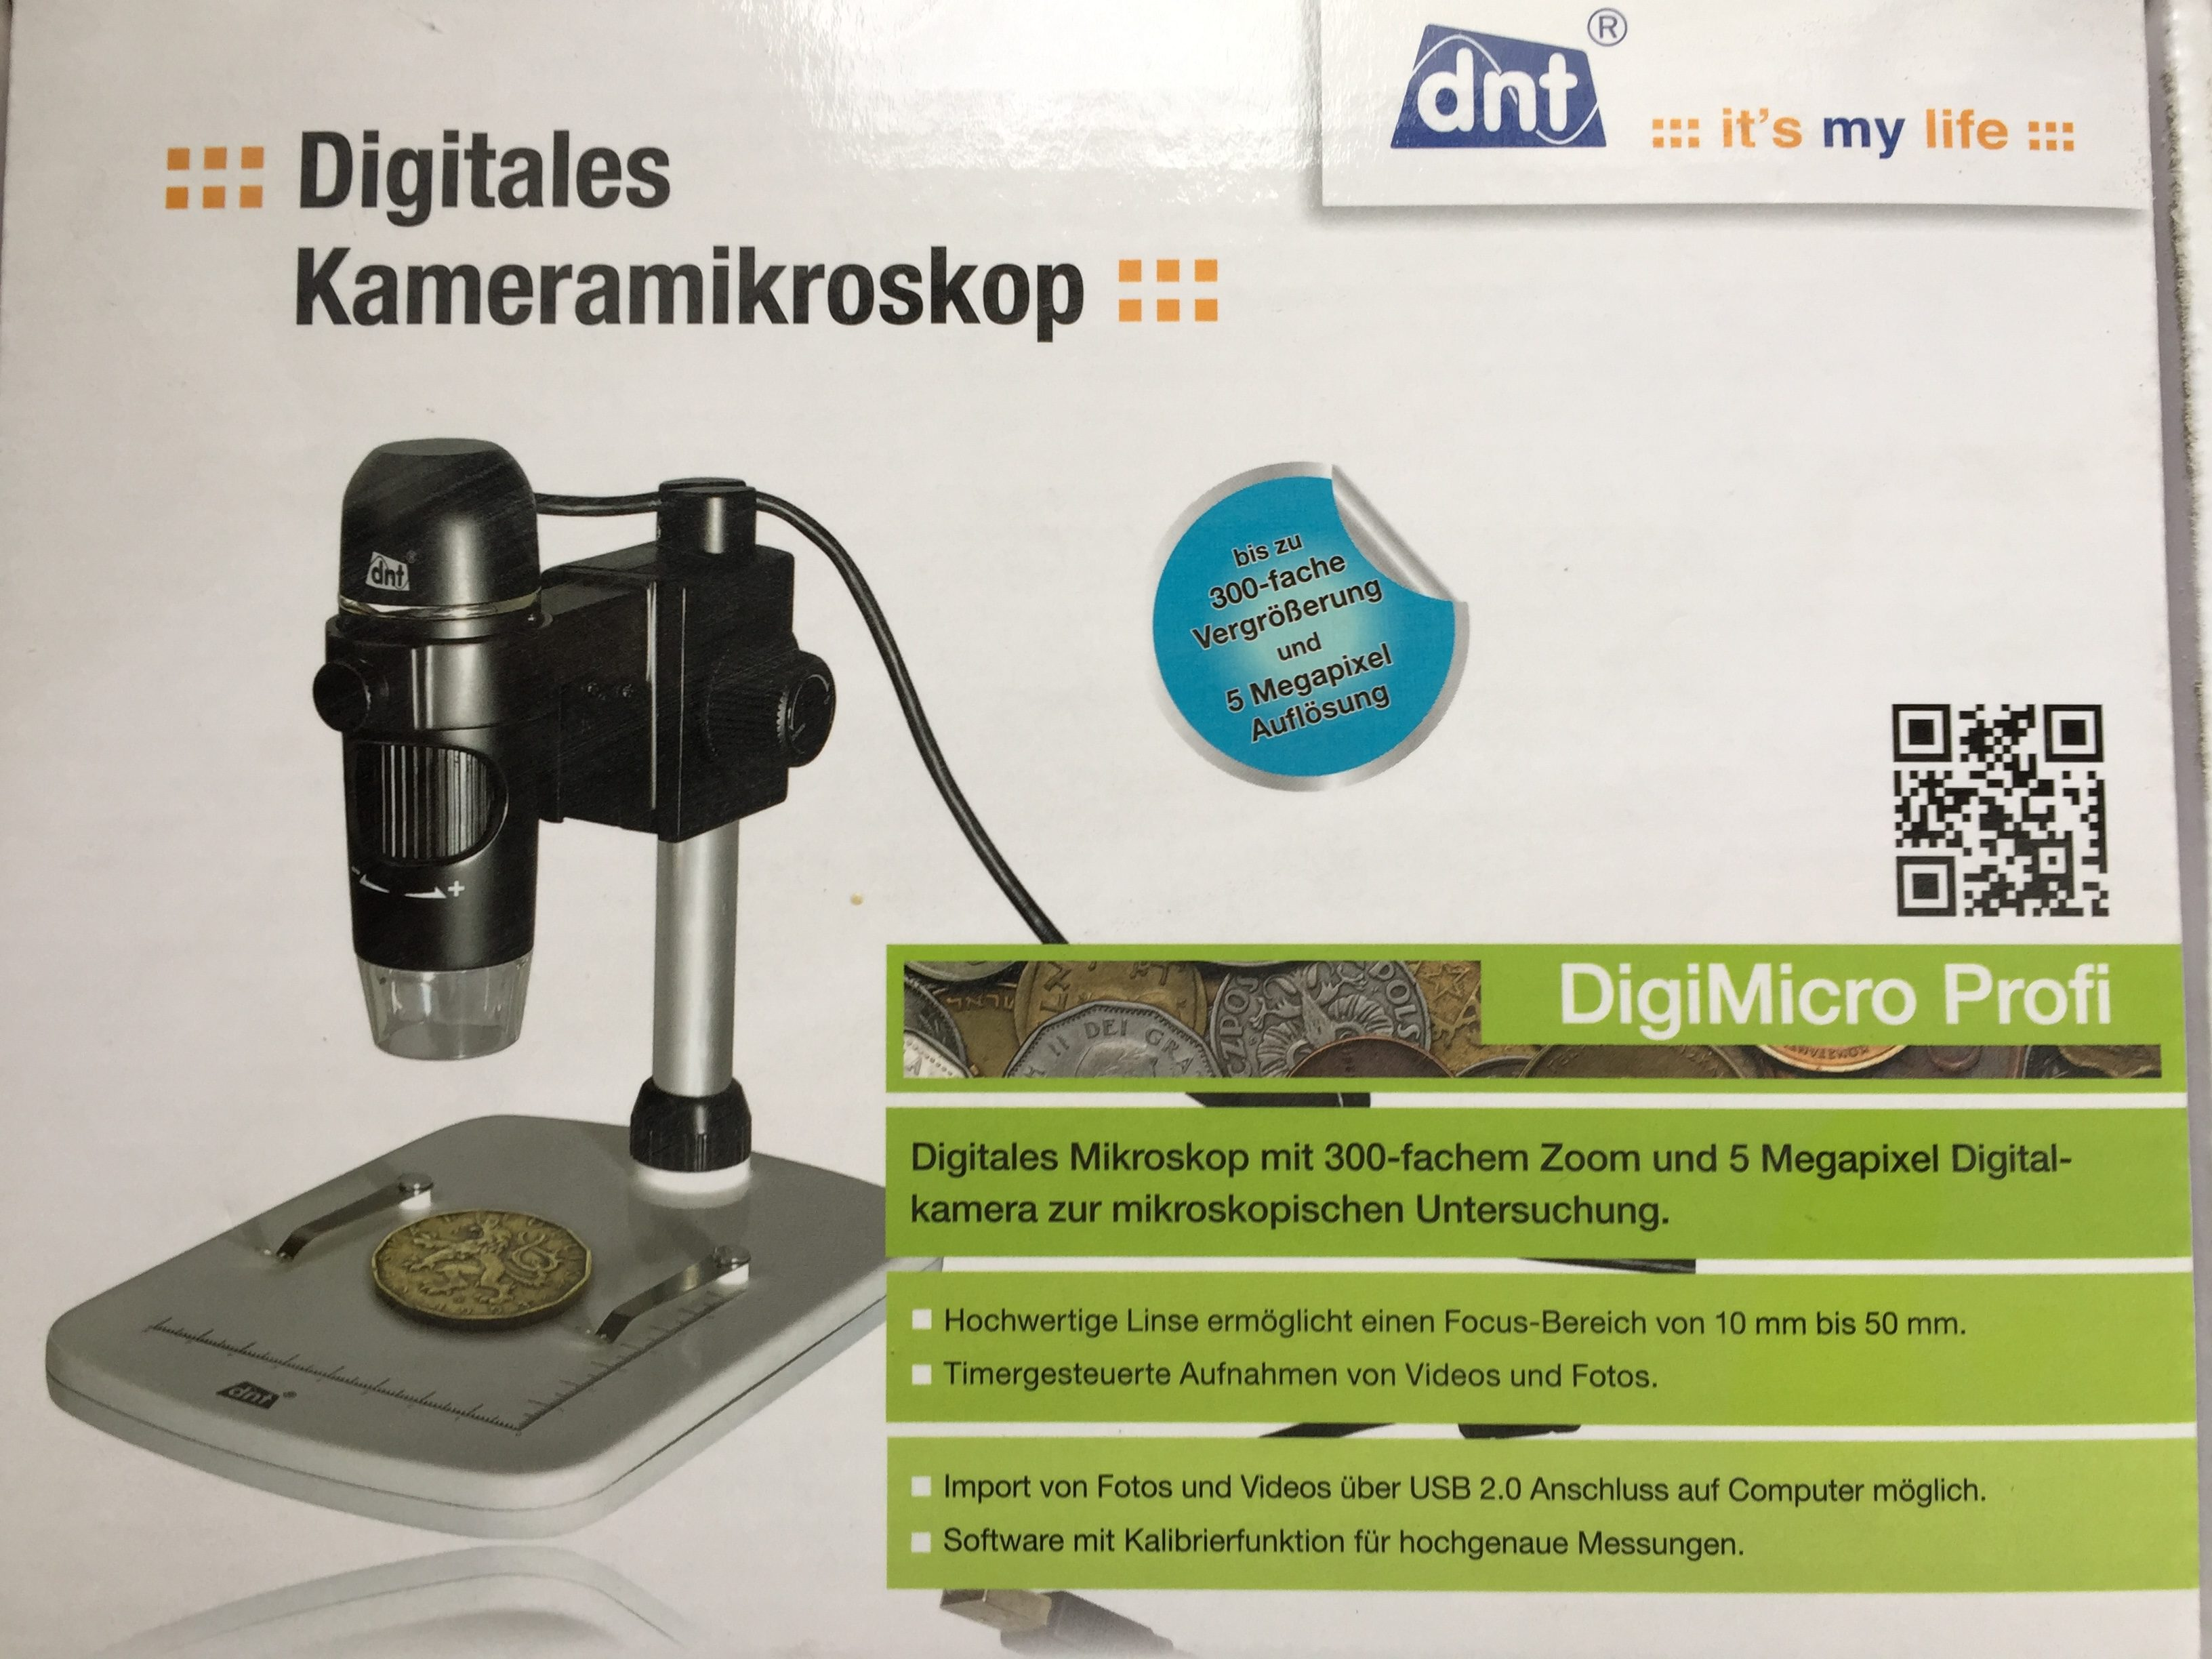 Mikroskop bildformate konvertieren light microscope